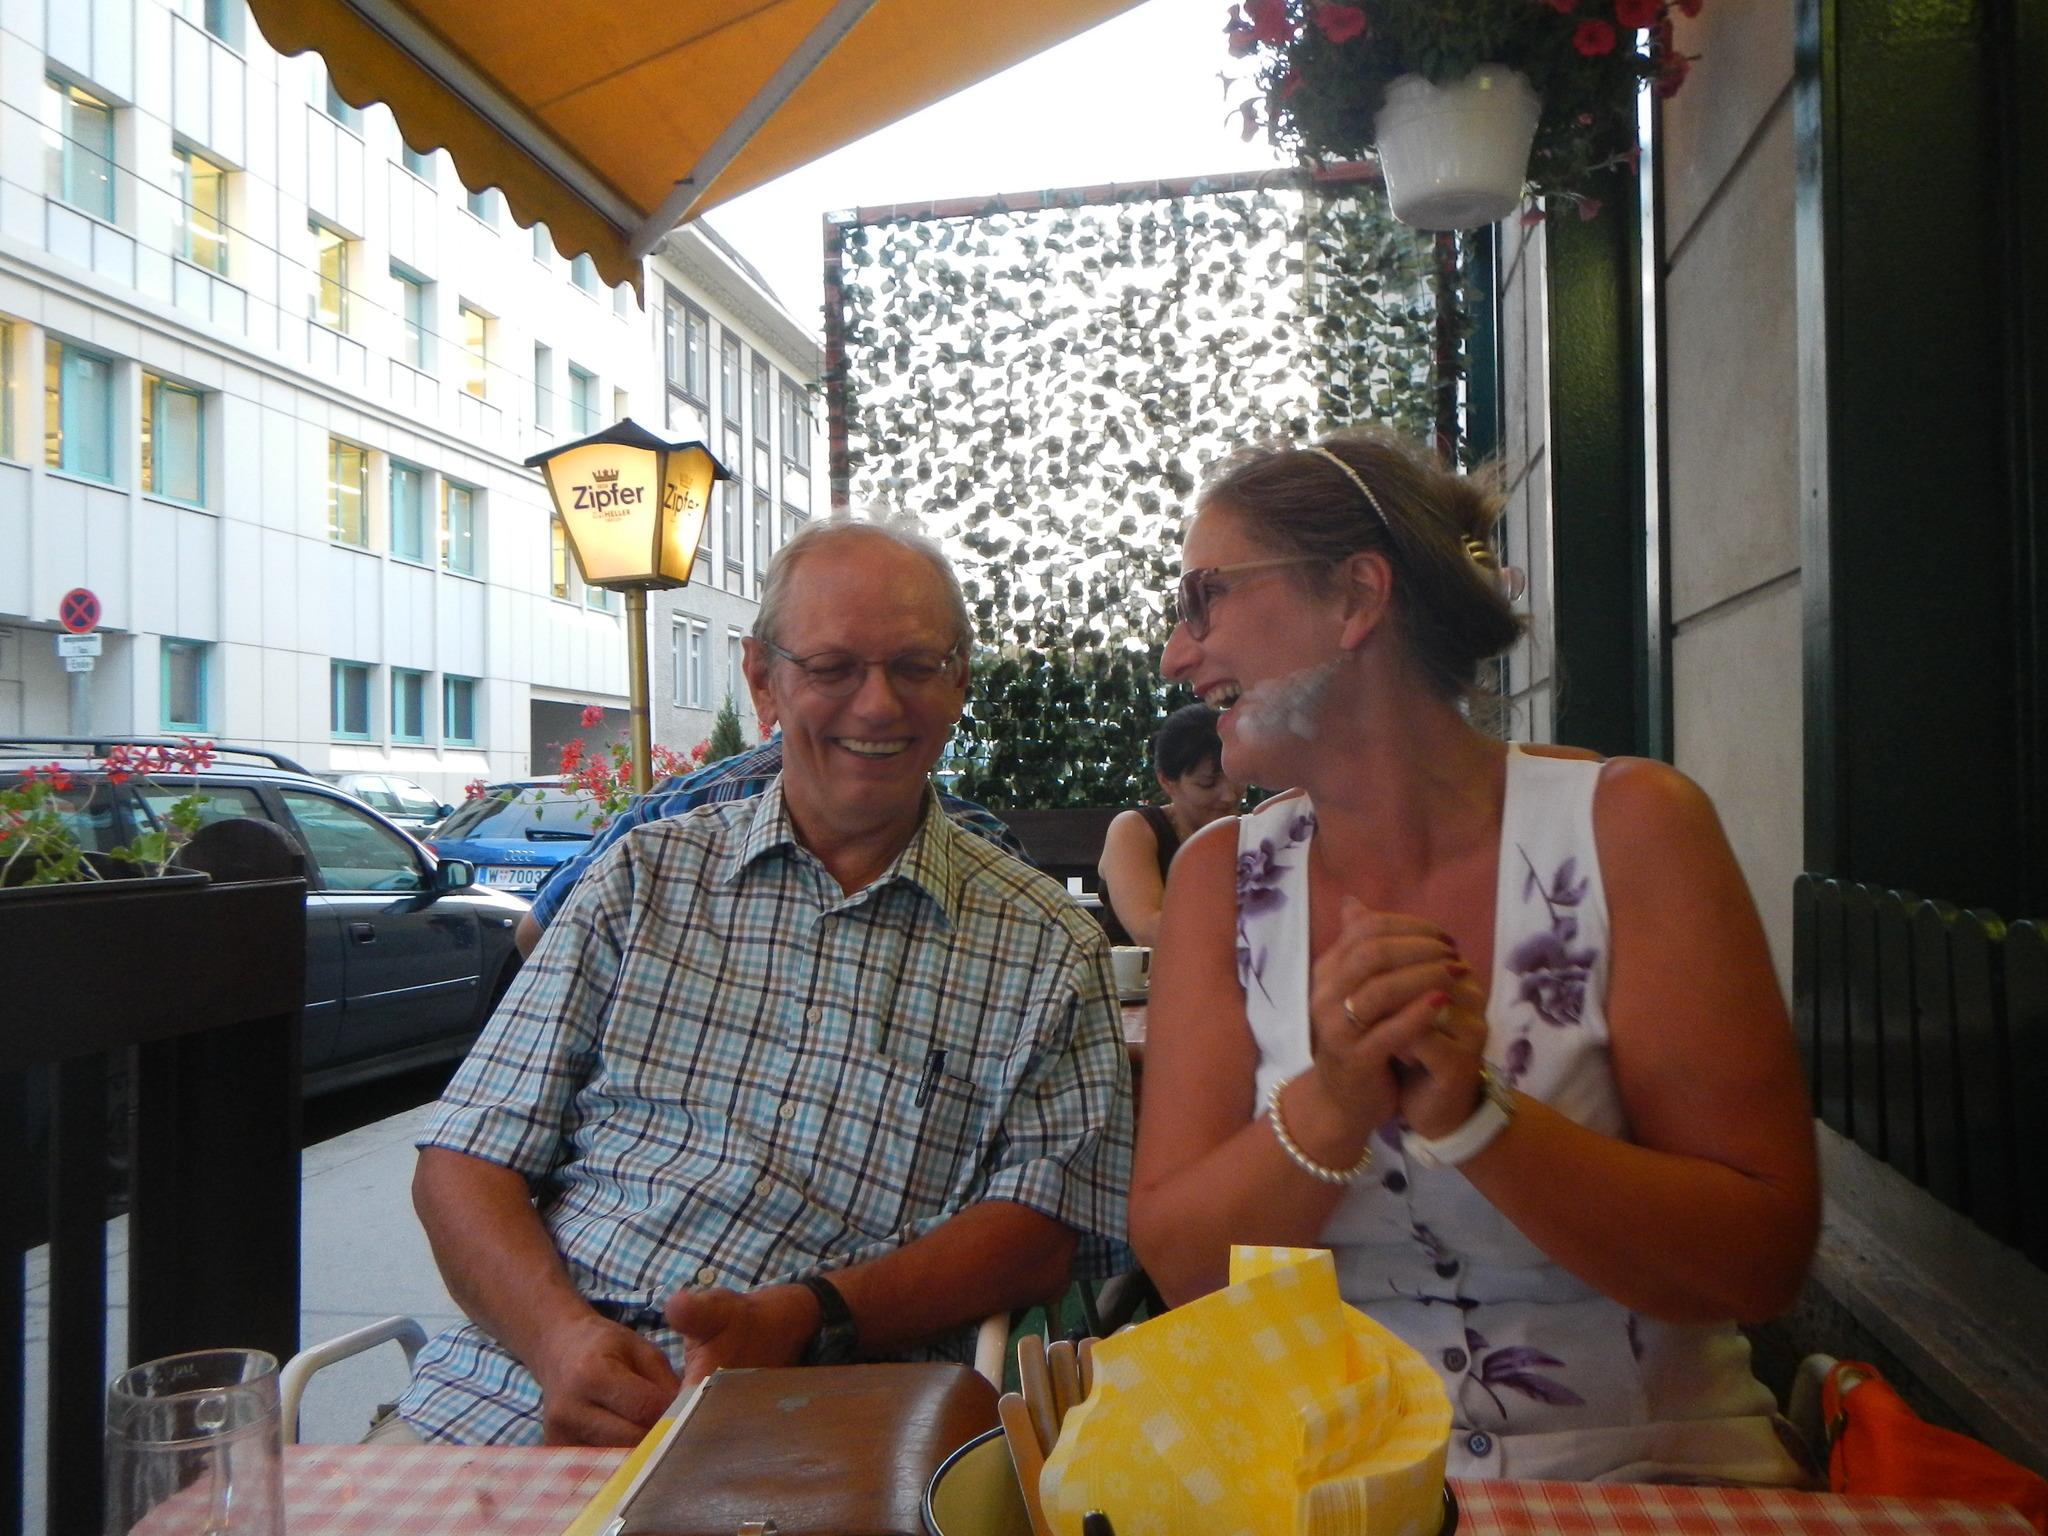 Kostenlose Singlebrse Breitenfurt Bei Wien, Flirt Kostenlos